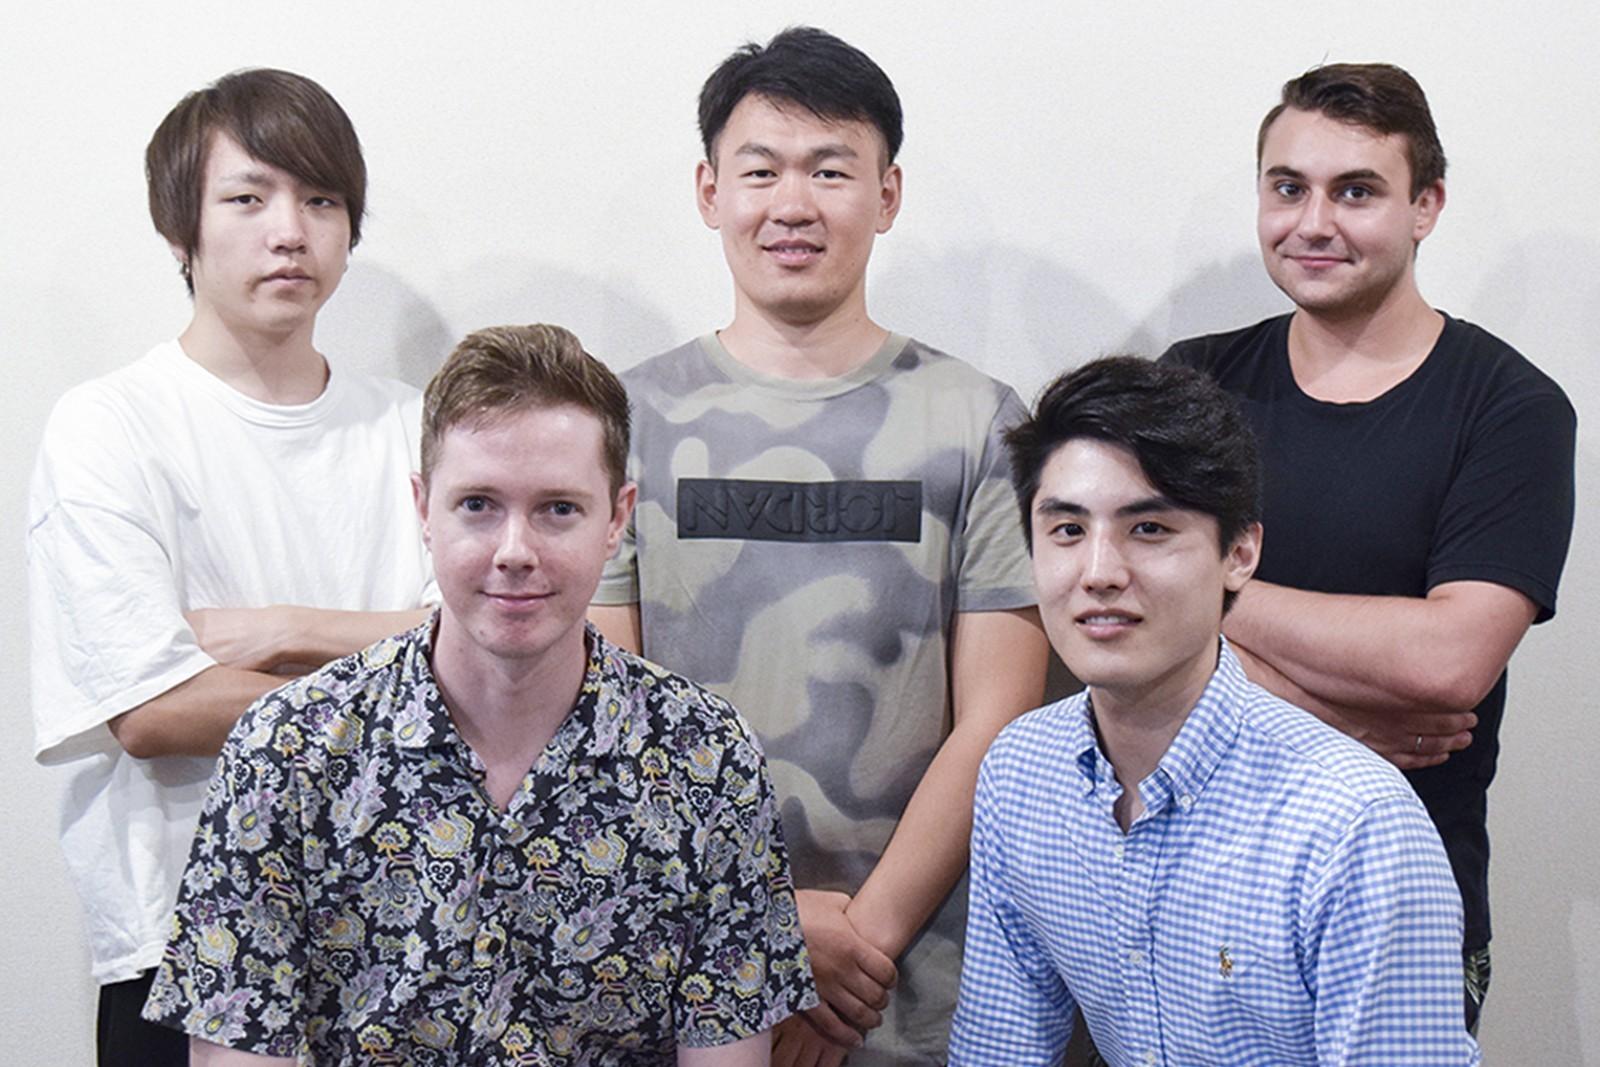 Vue.jsで新しい購買体験を創るフロントエンジニア募集!